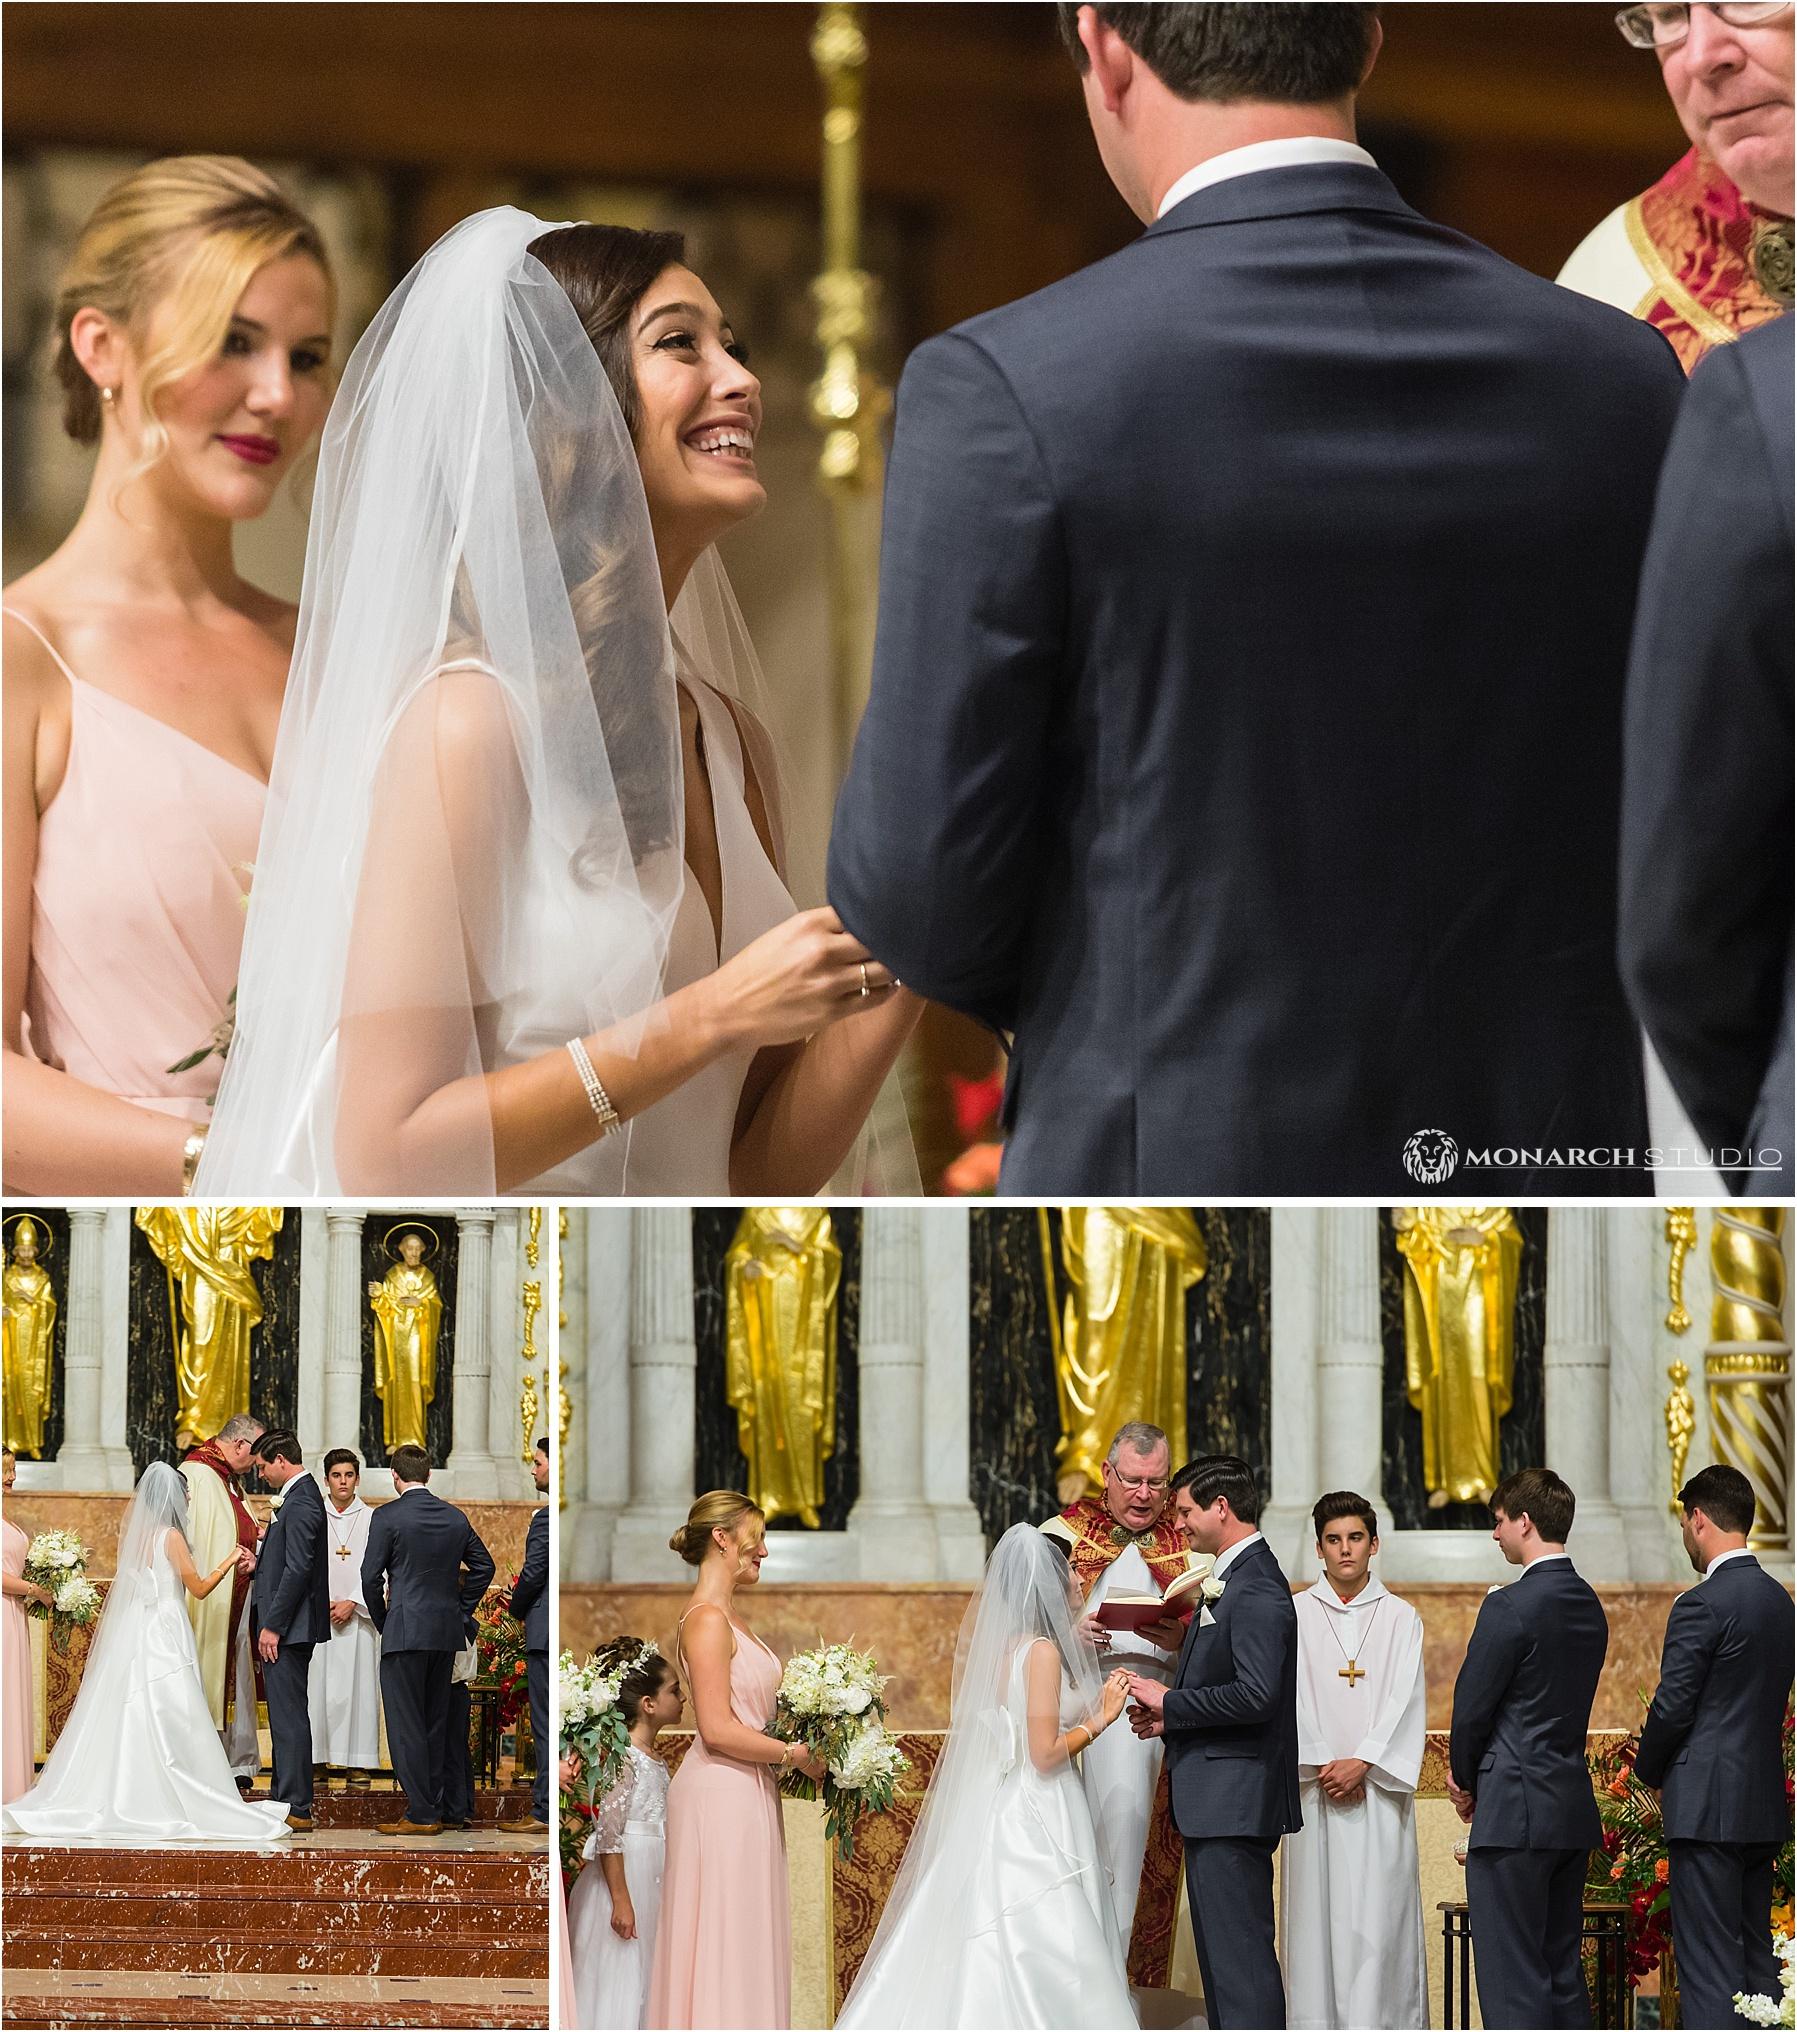 st-augustine-wedding-photographer-068.jpg